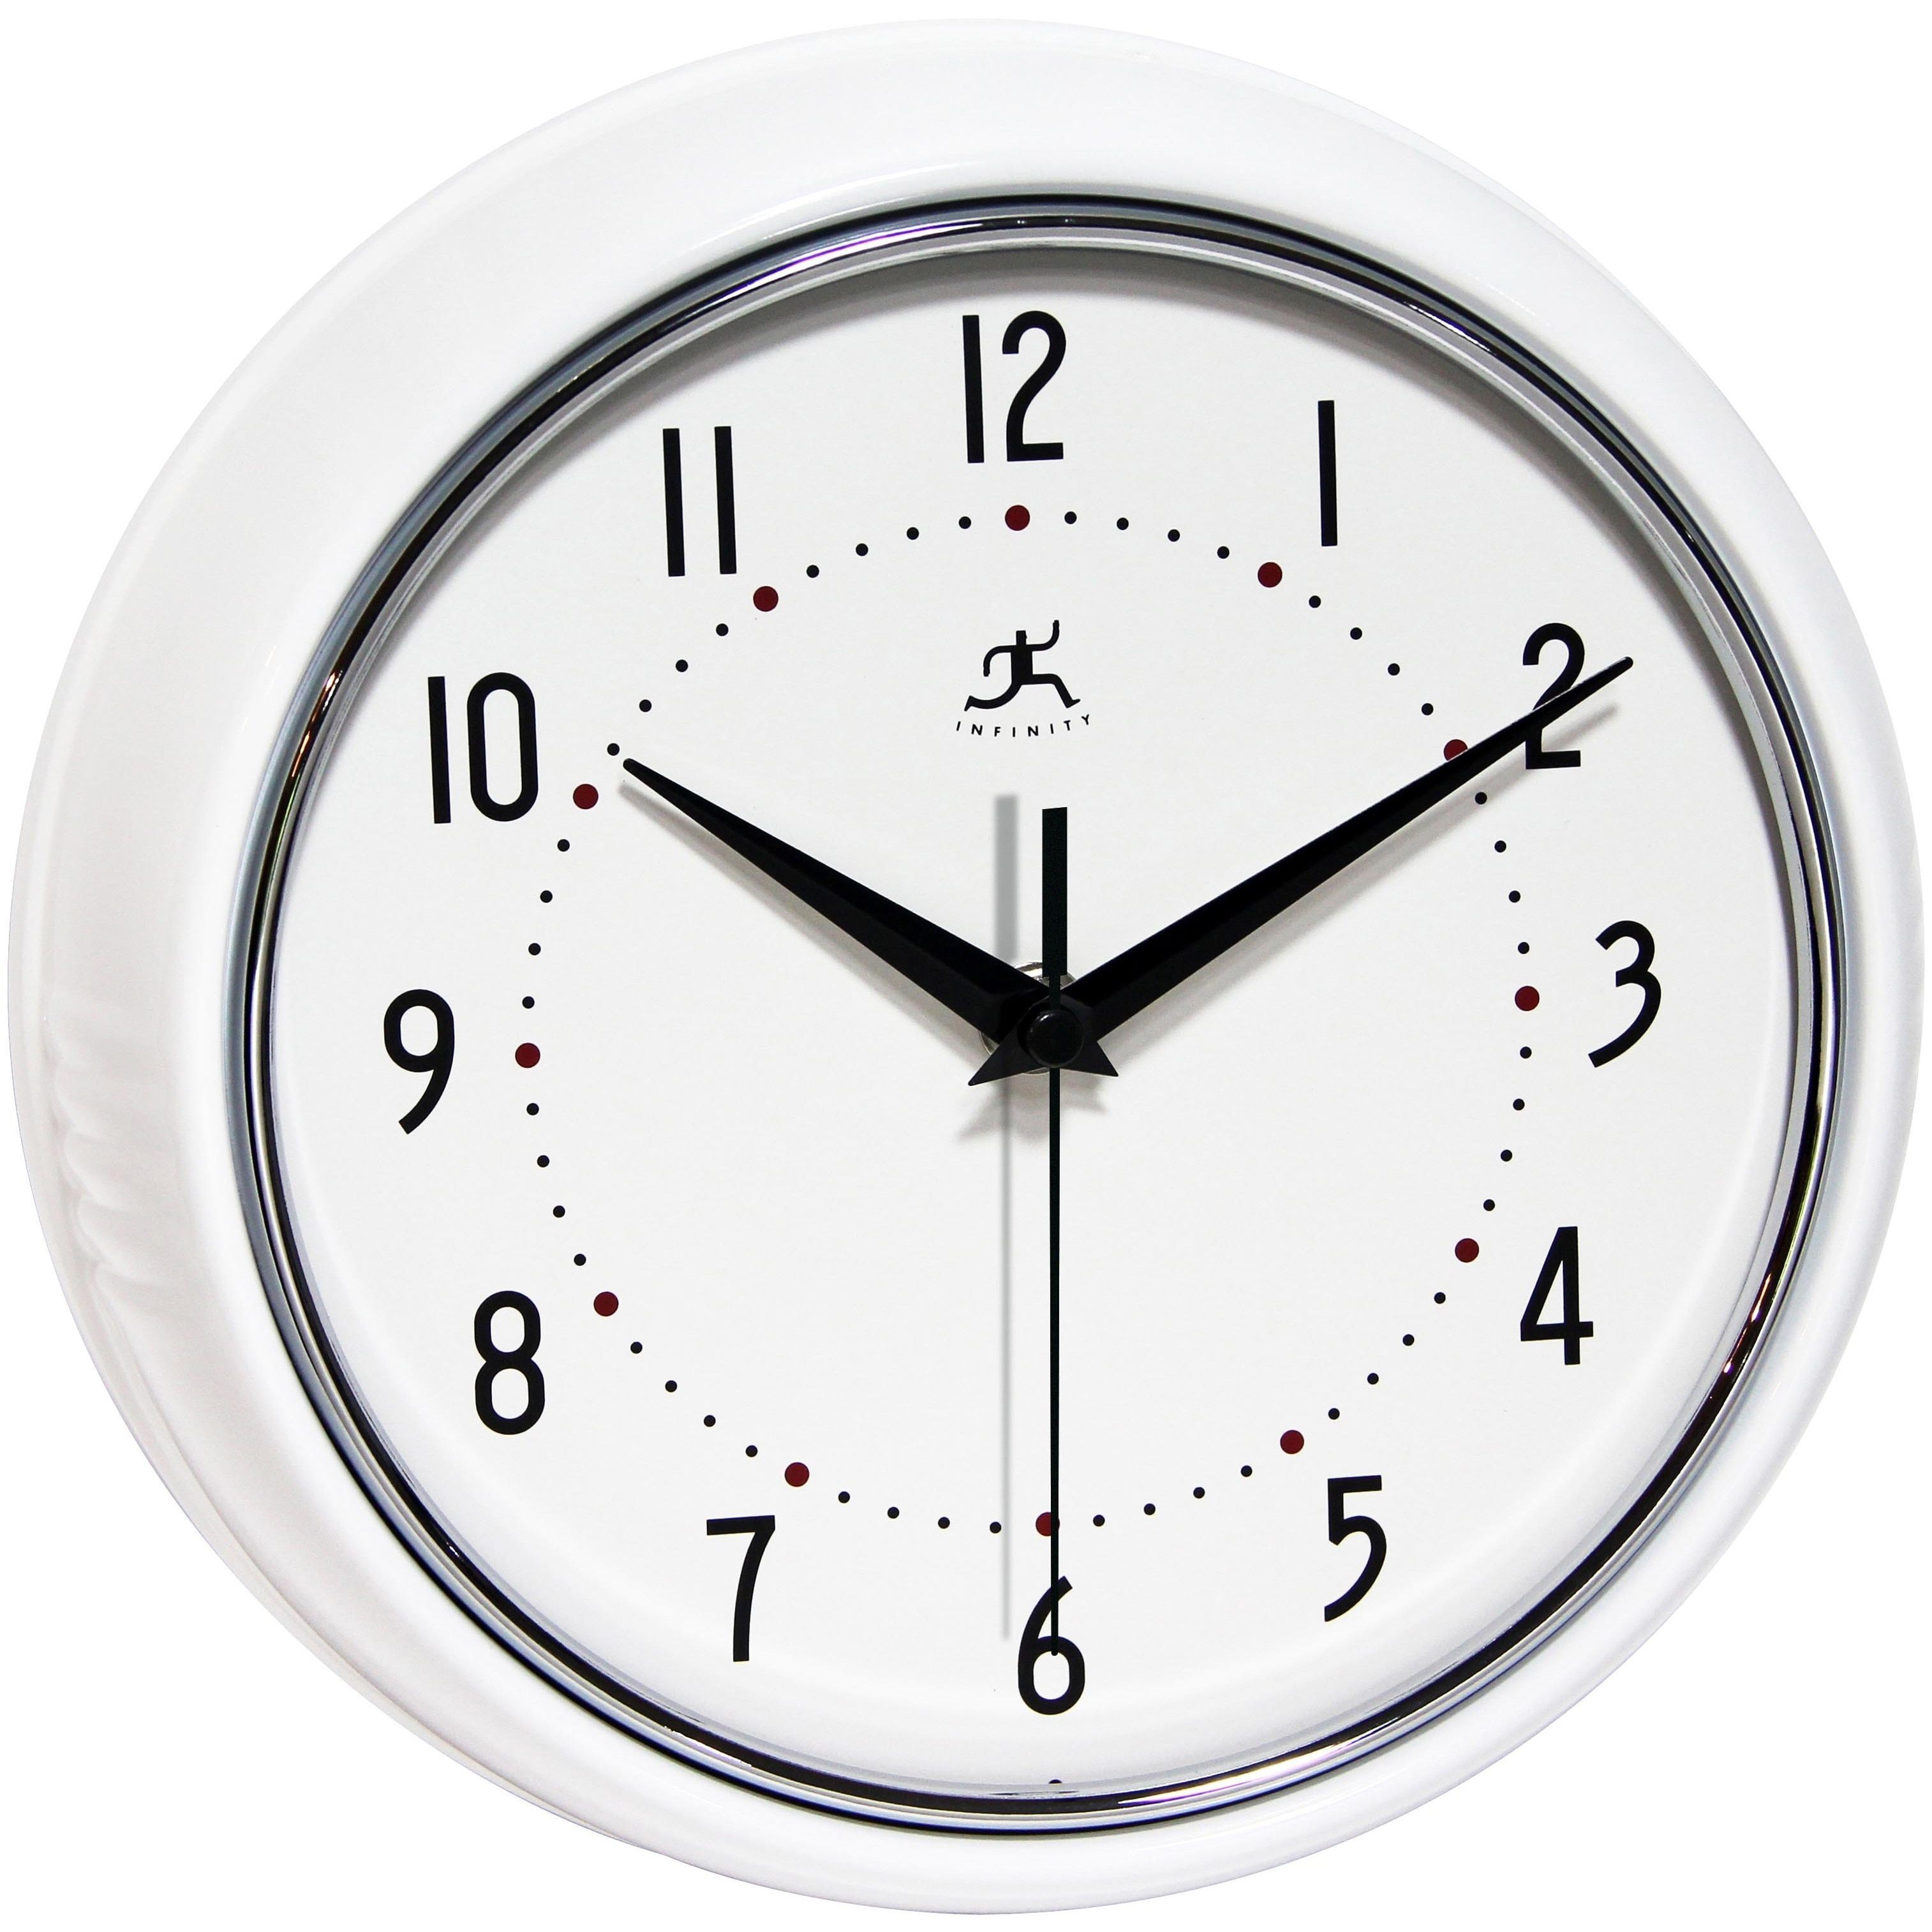 Infinity Instruments Retro 9.5-inch Round Wall Clock